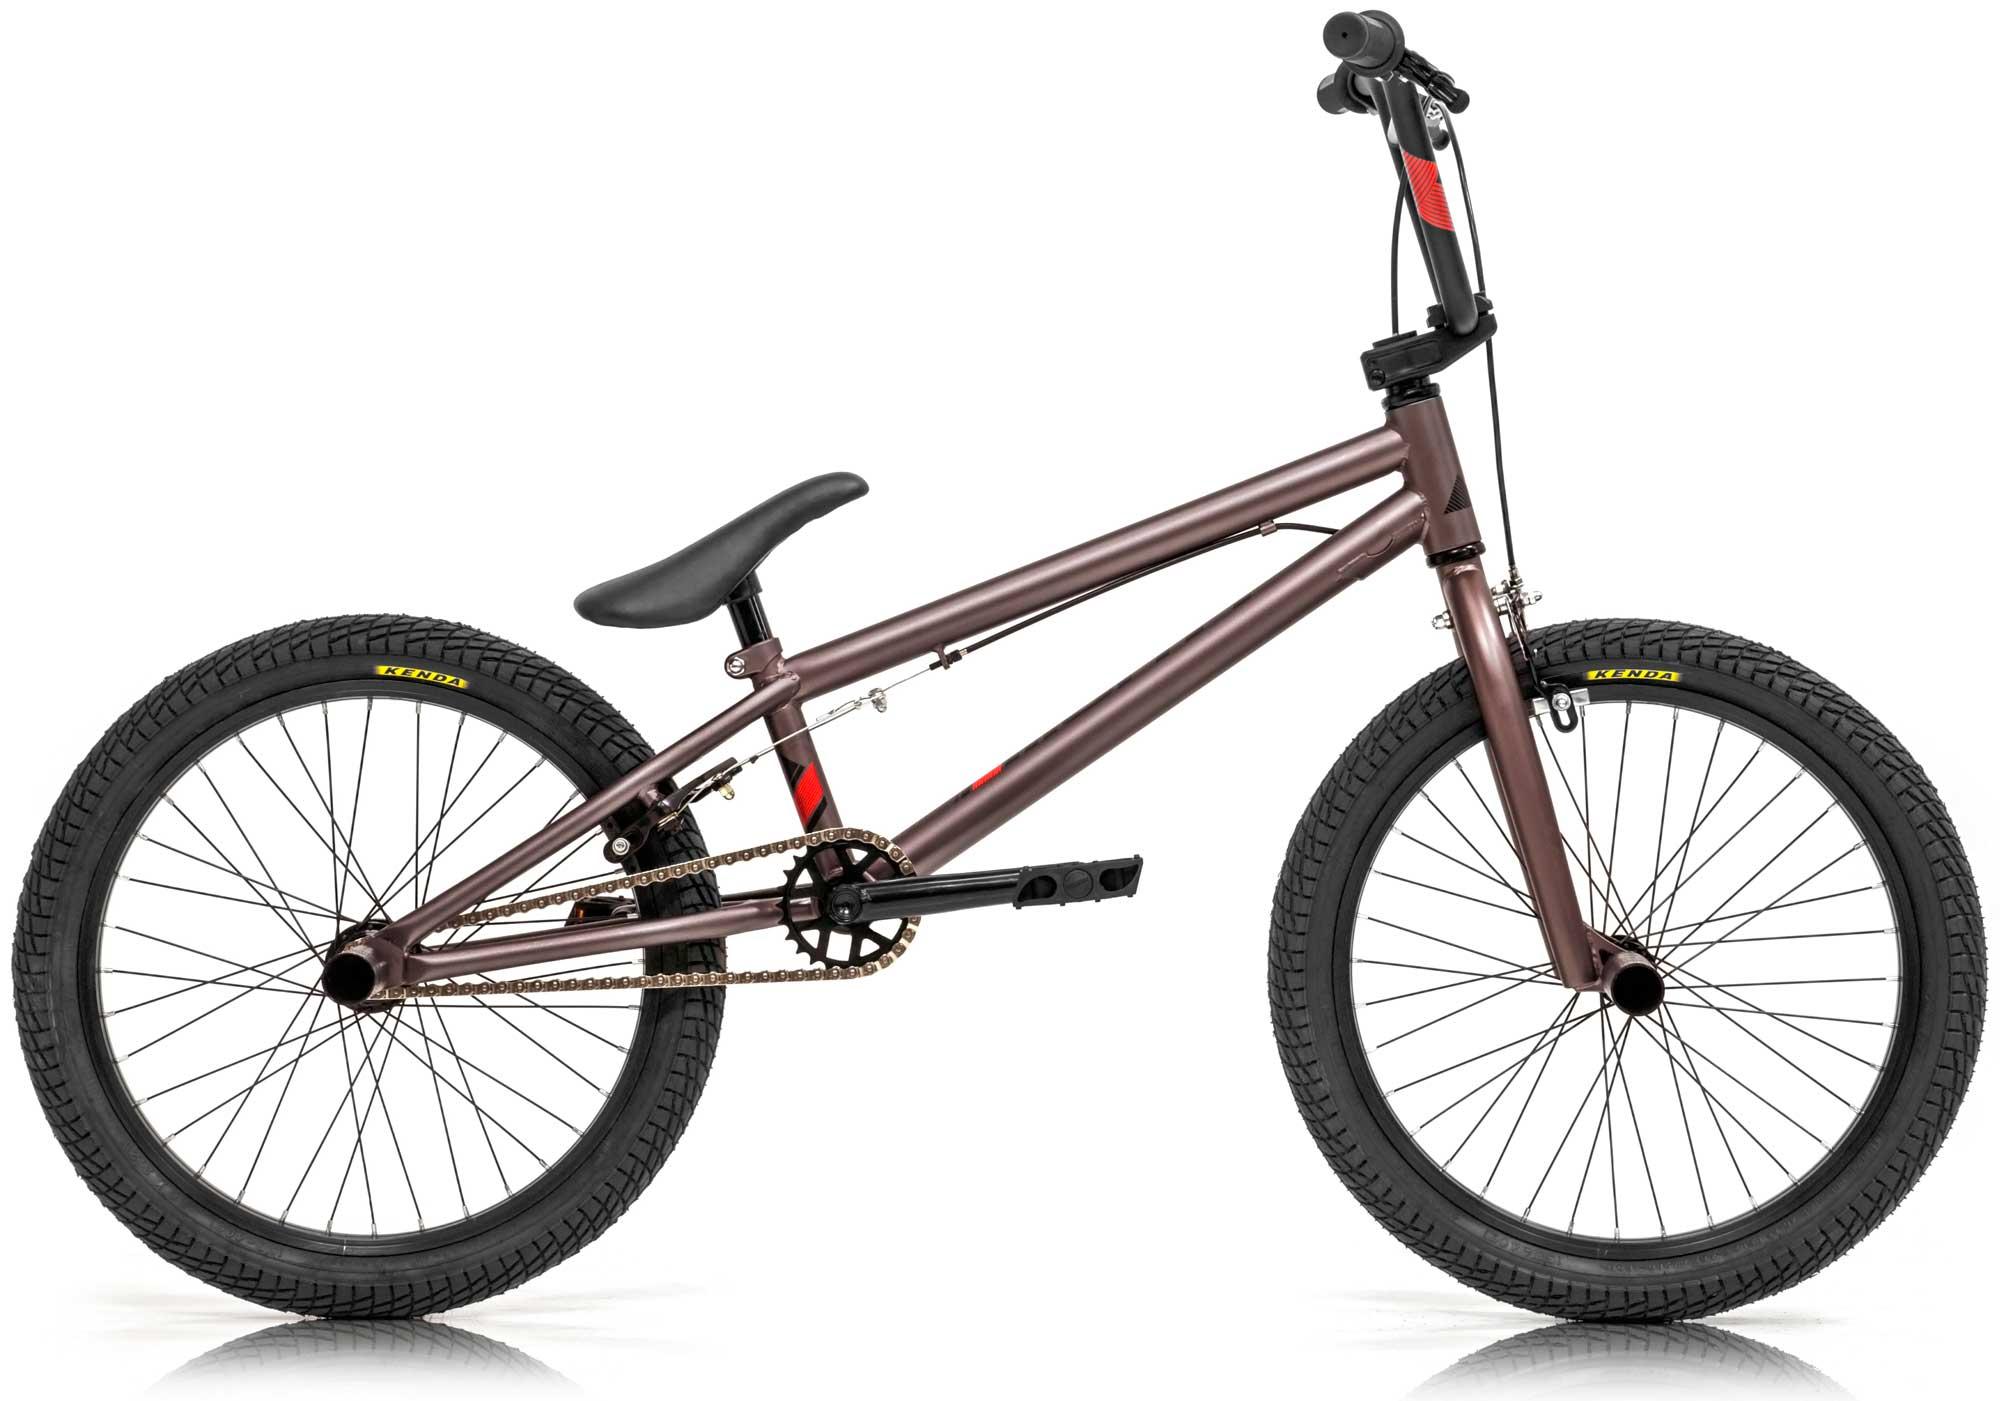 Bicicleta FREE 301 freestyle, color cobre